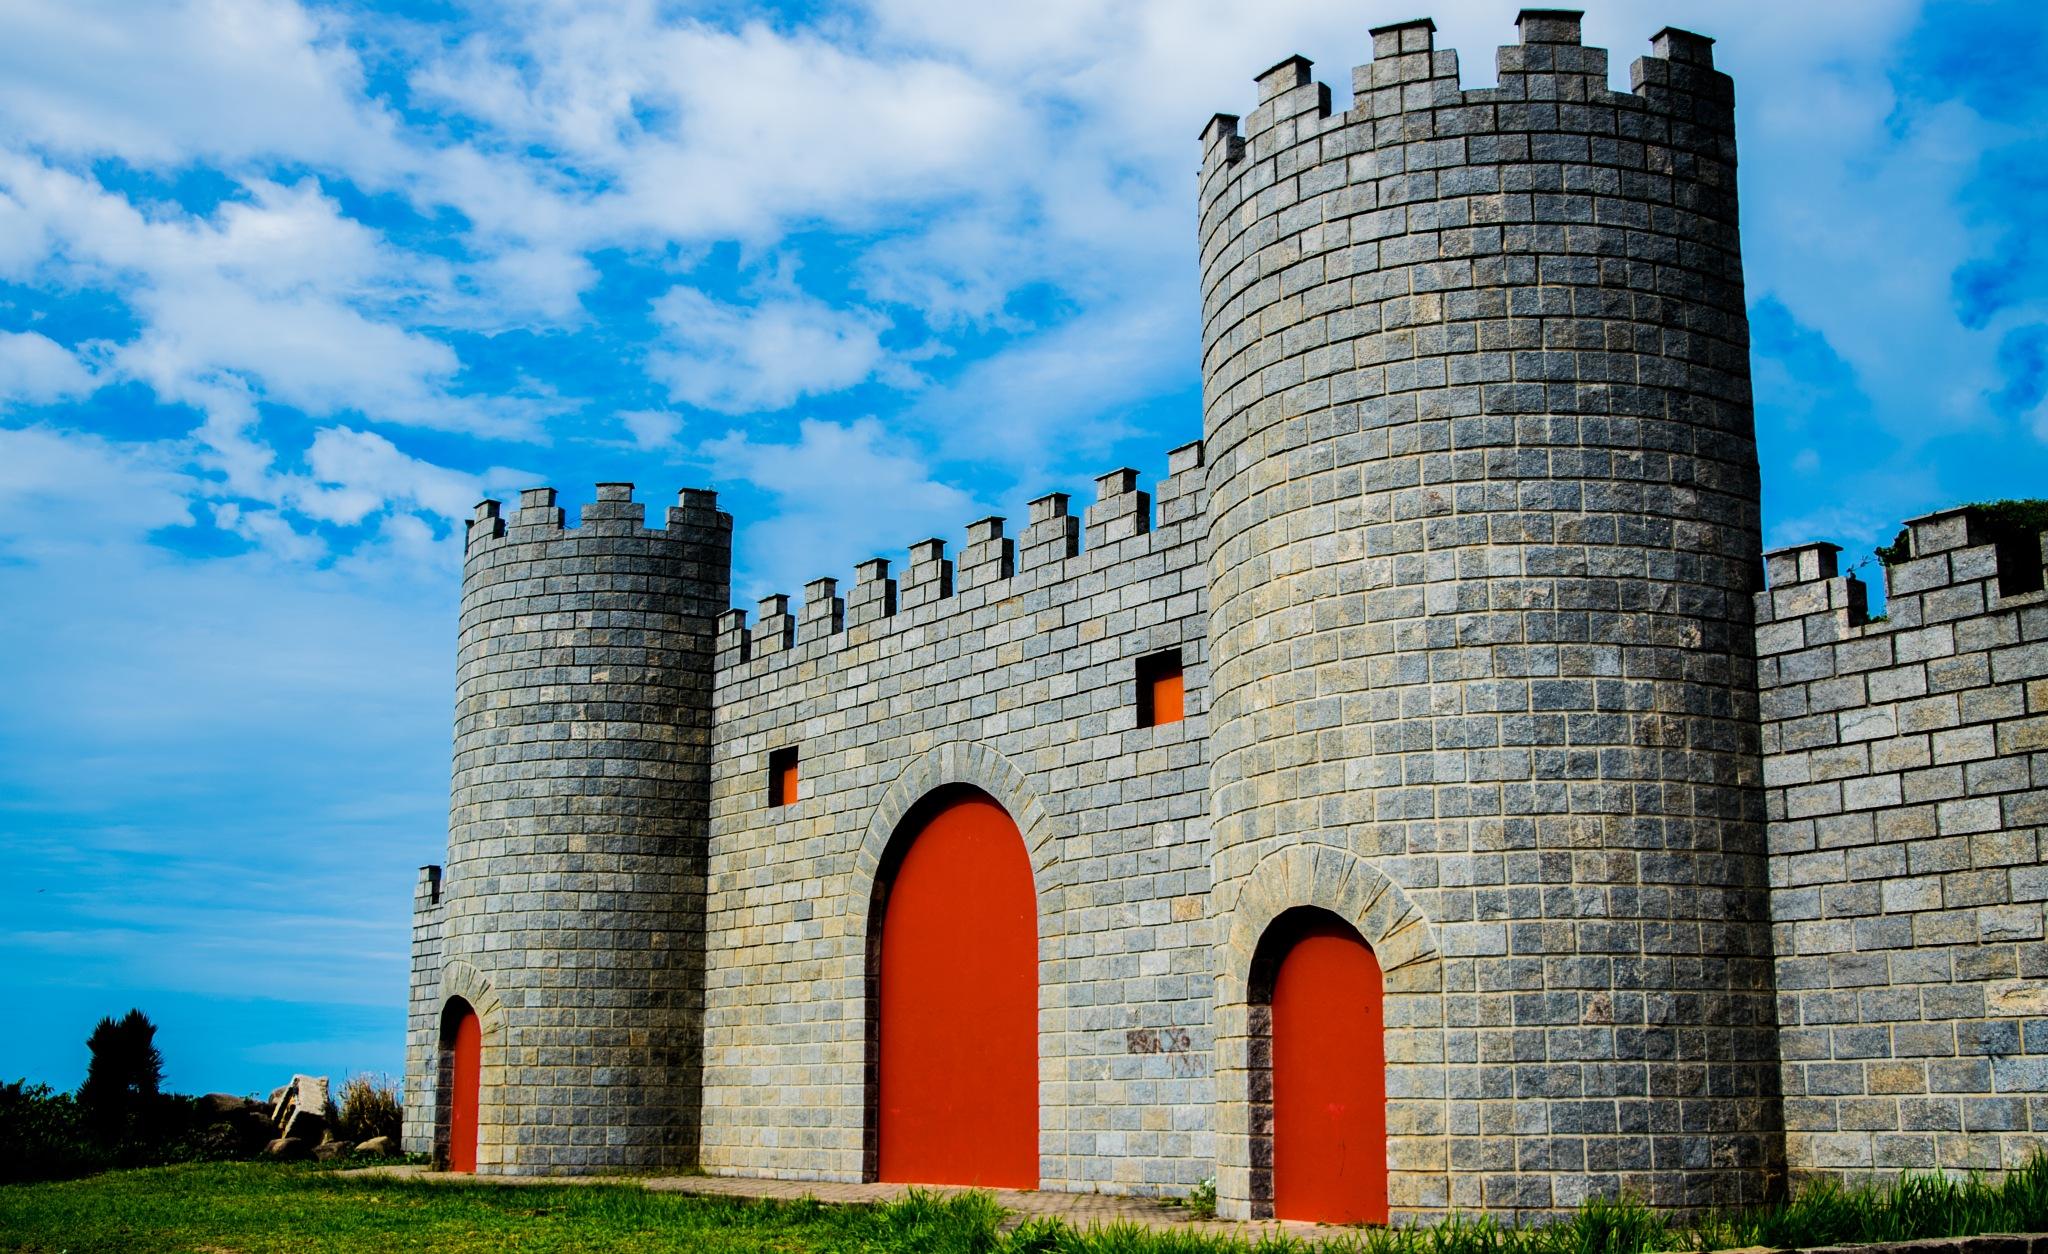 Castelo by Leandro Moura